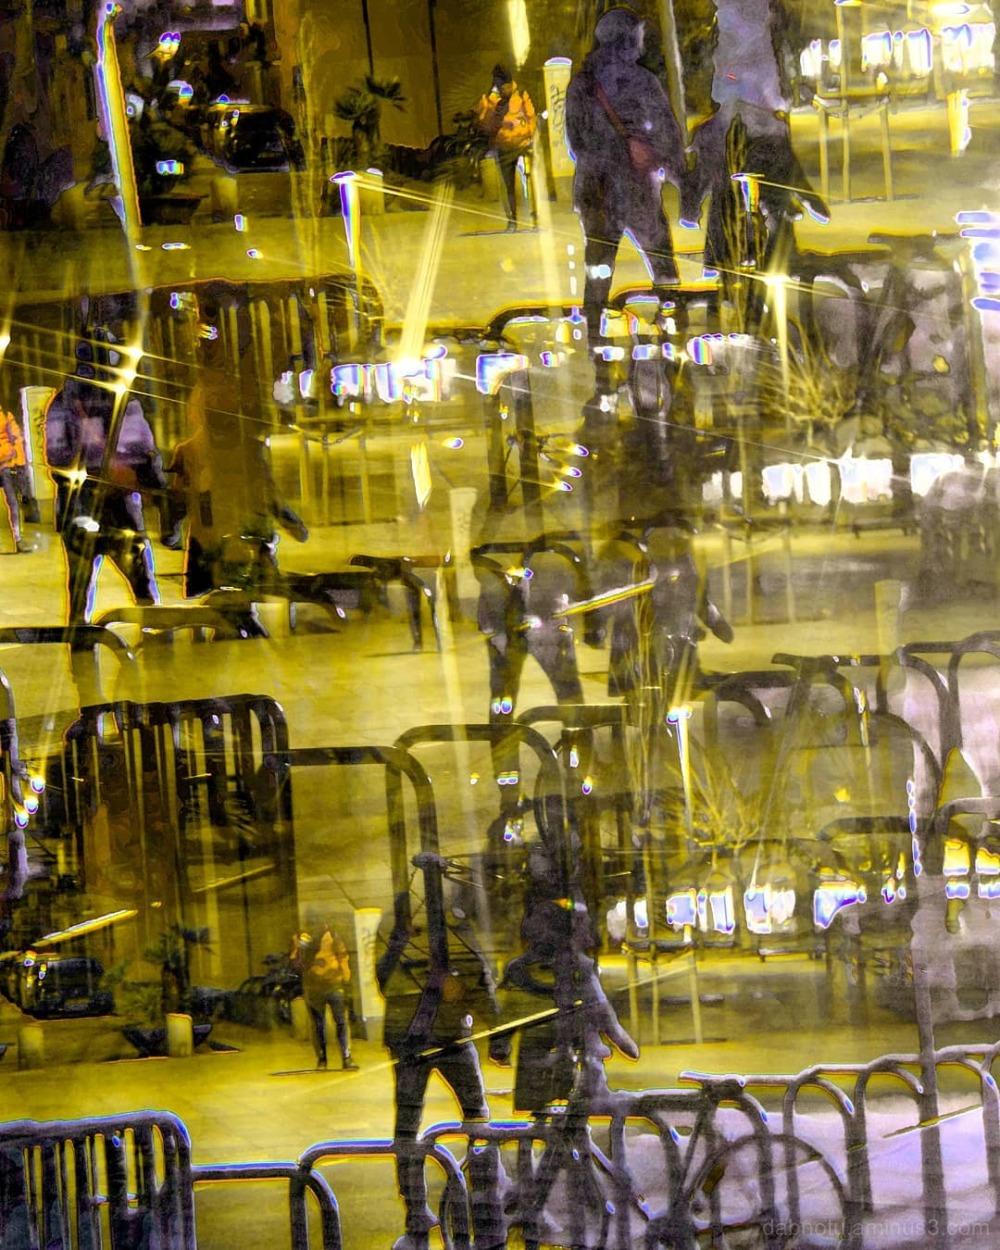 #PlaçaDelMar #LaBarceloneta #CiutatVella